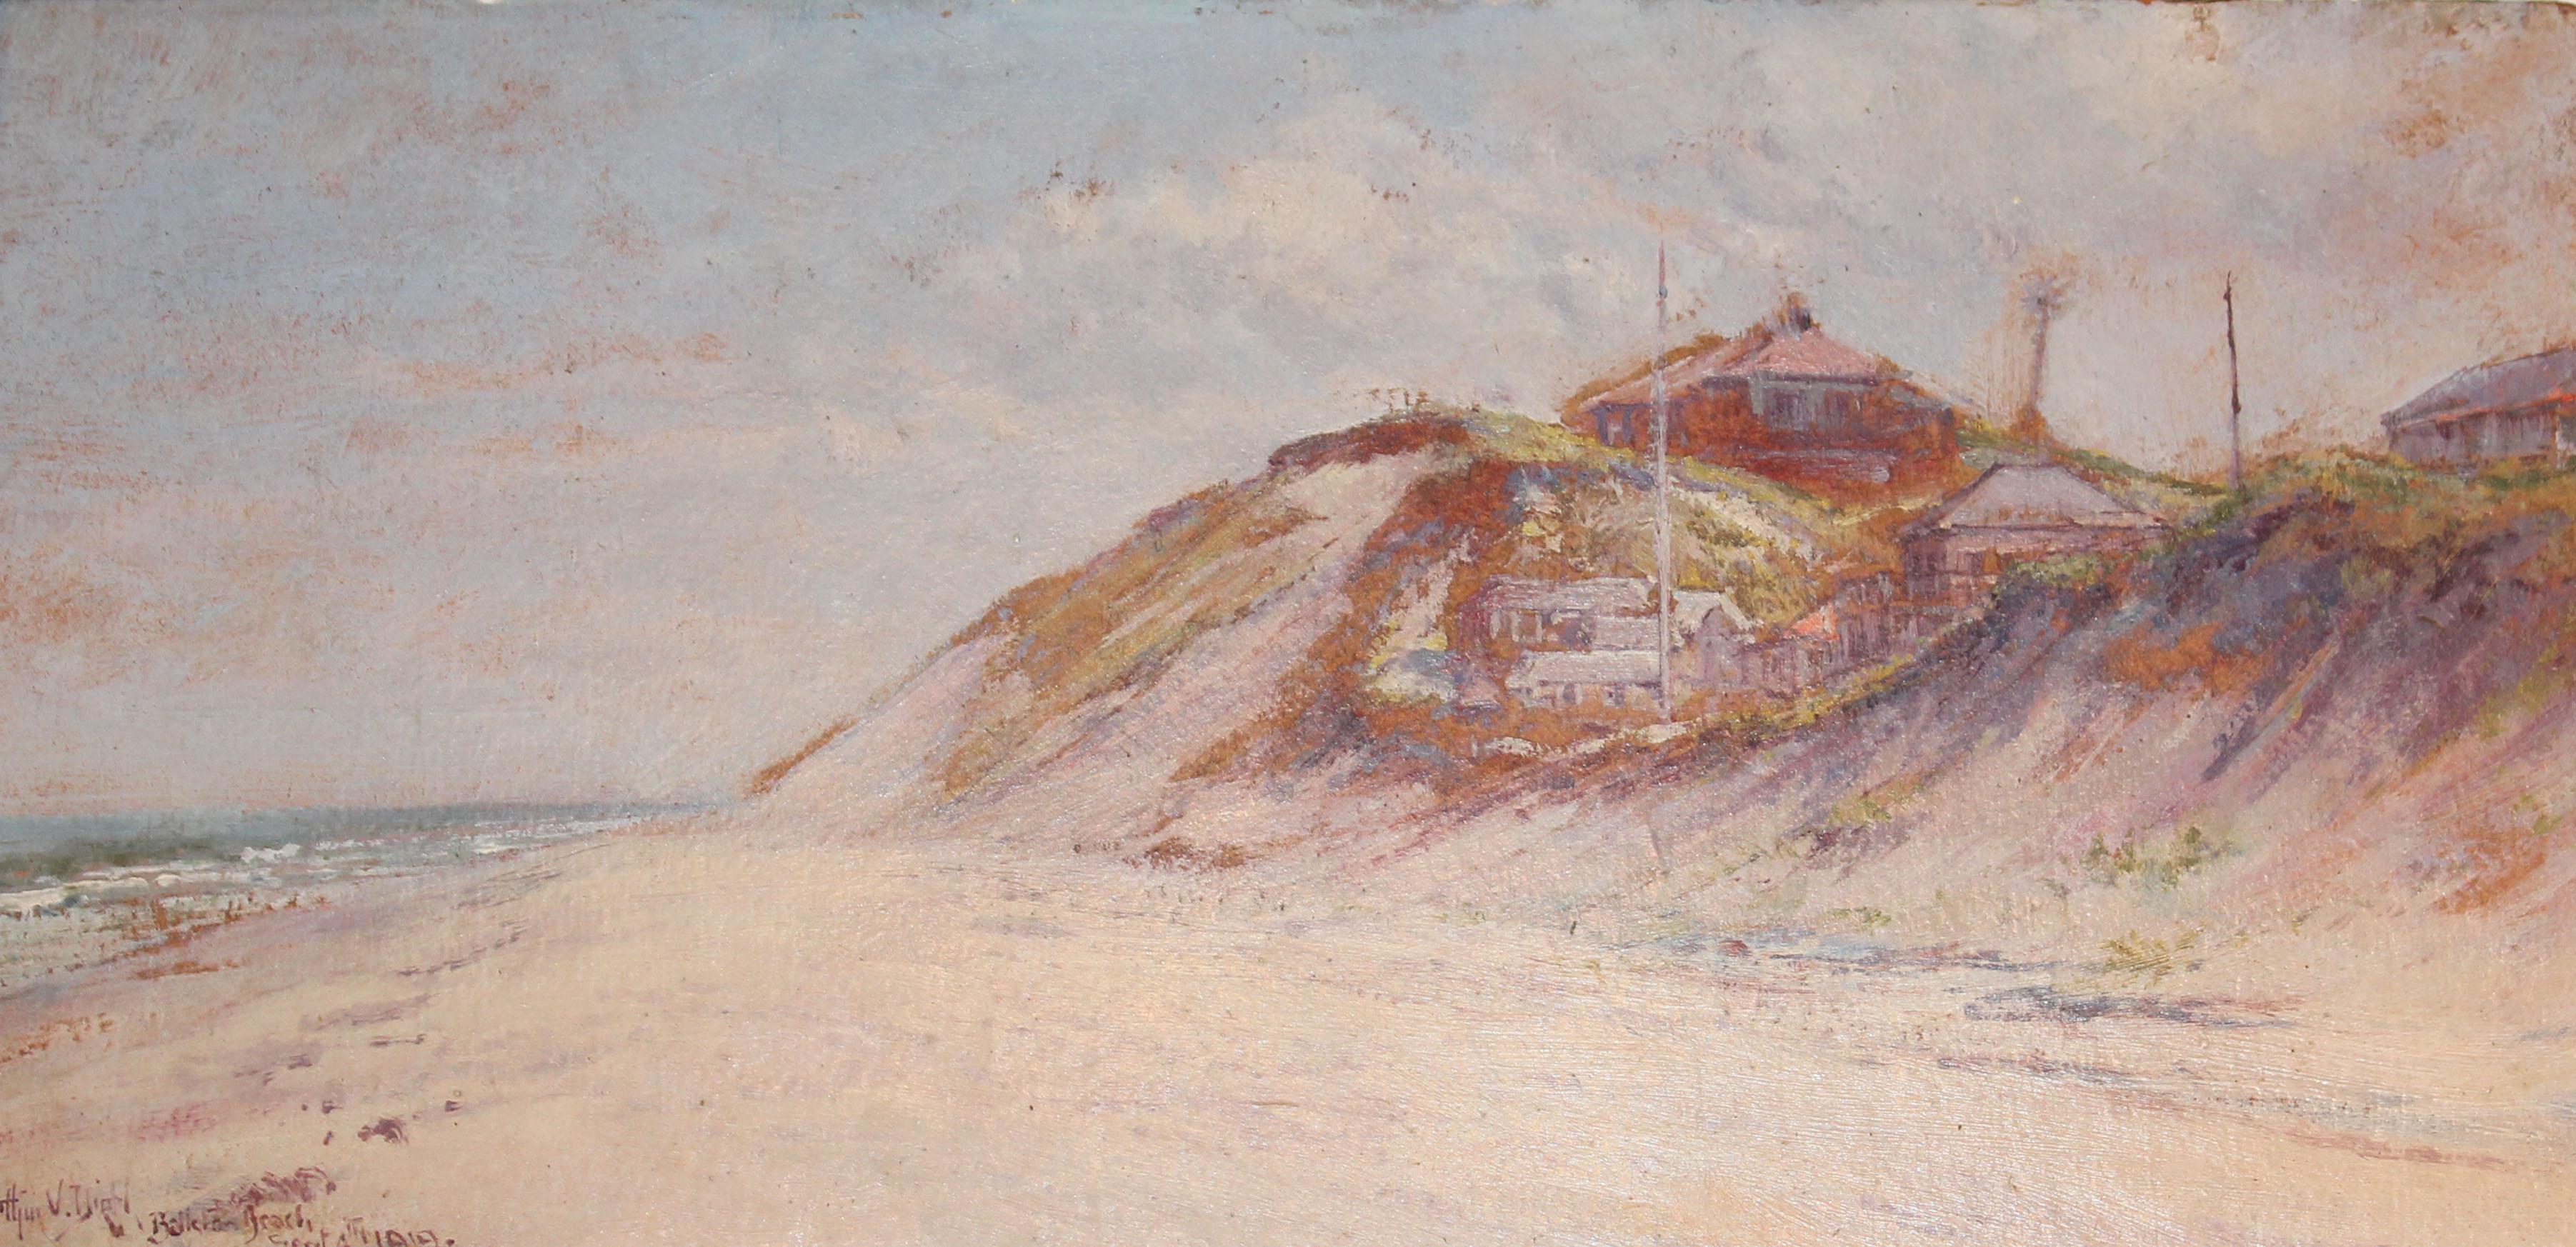 'Ballston Beach, September 4, 1919'